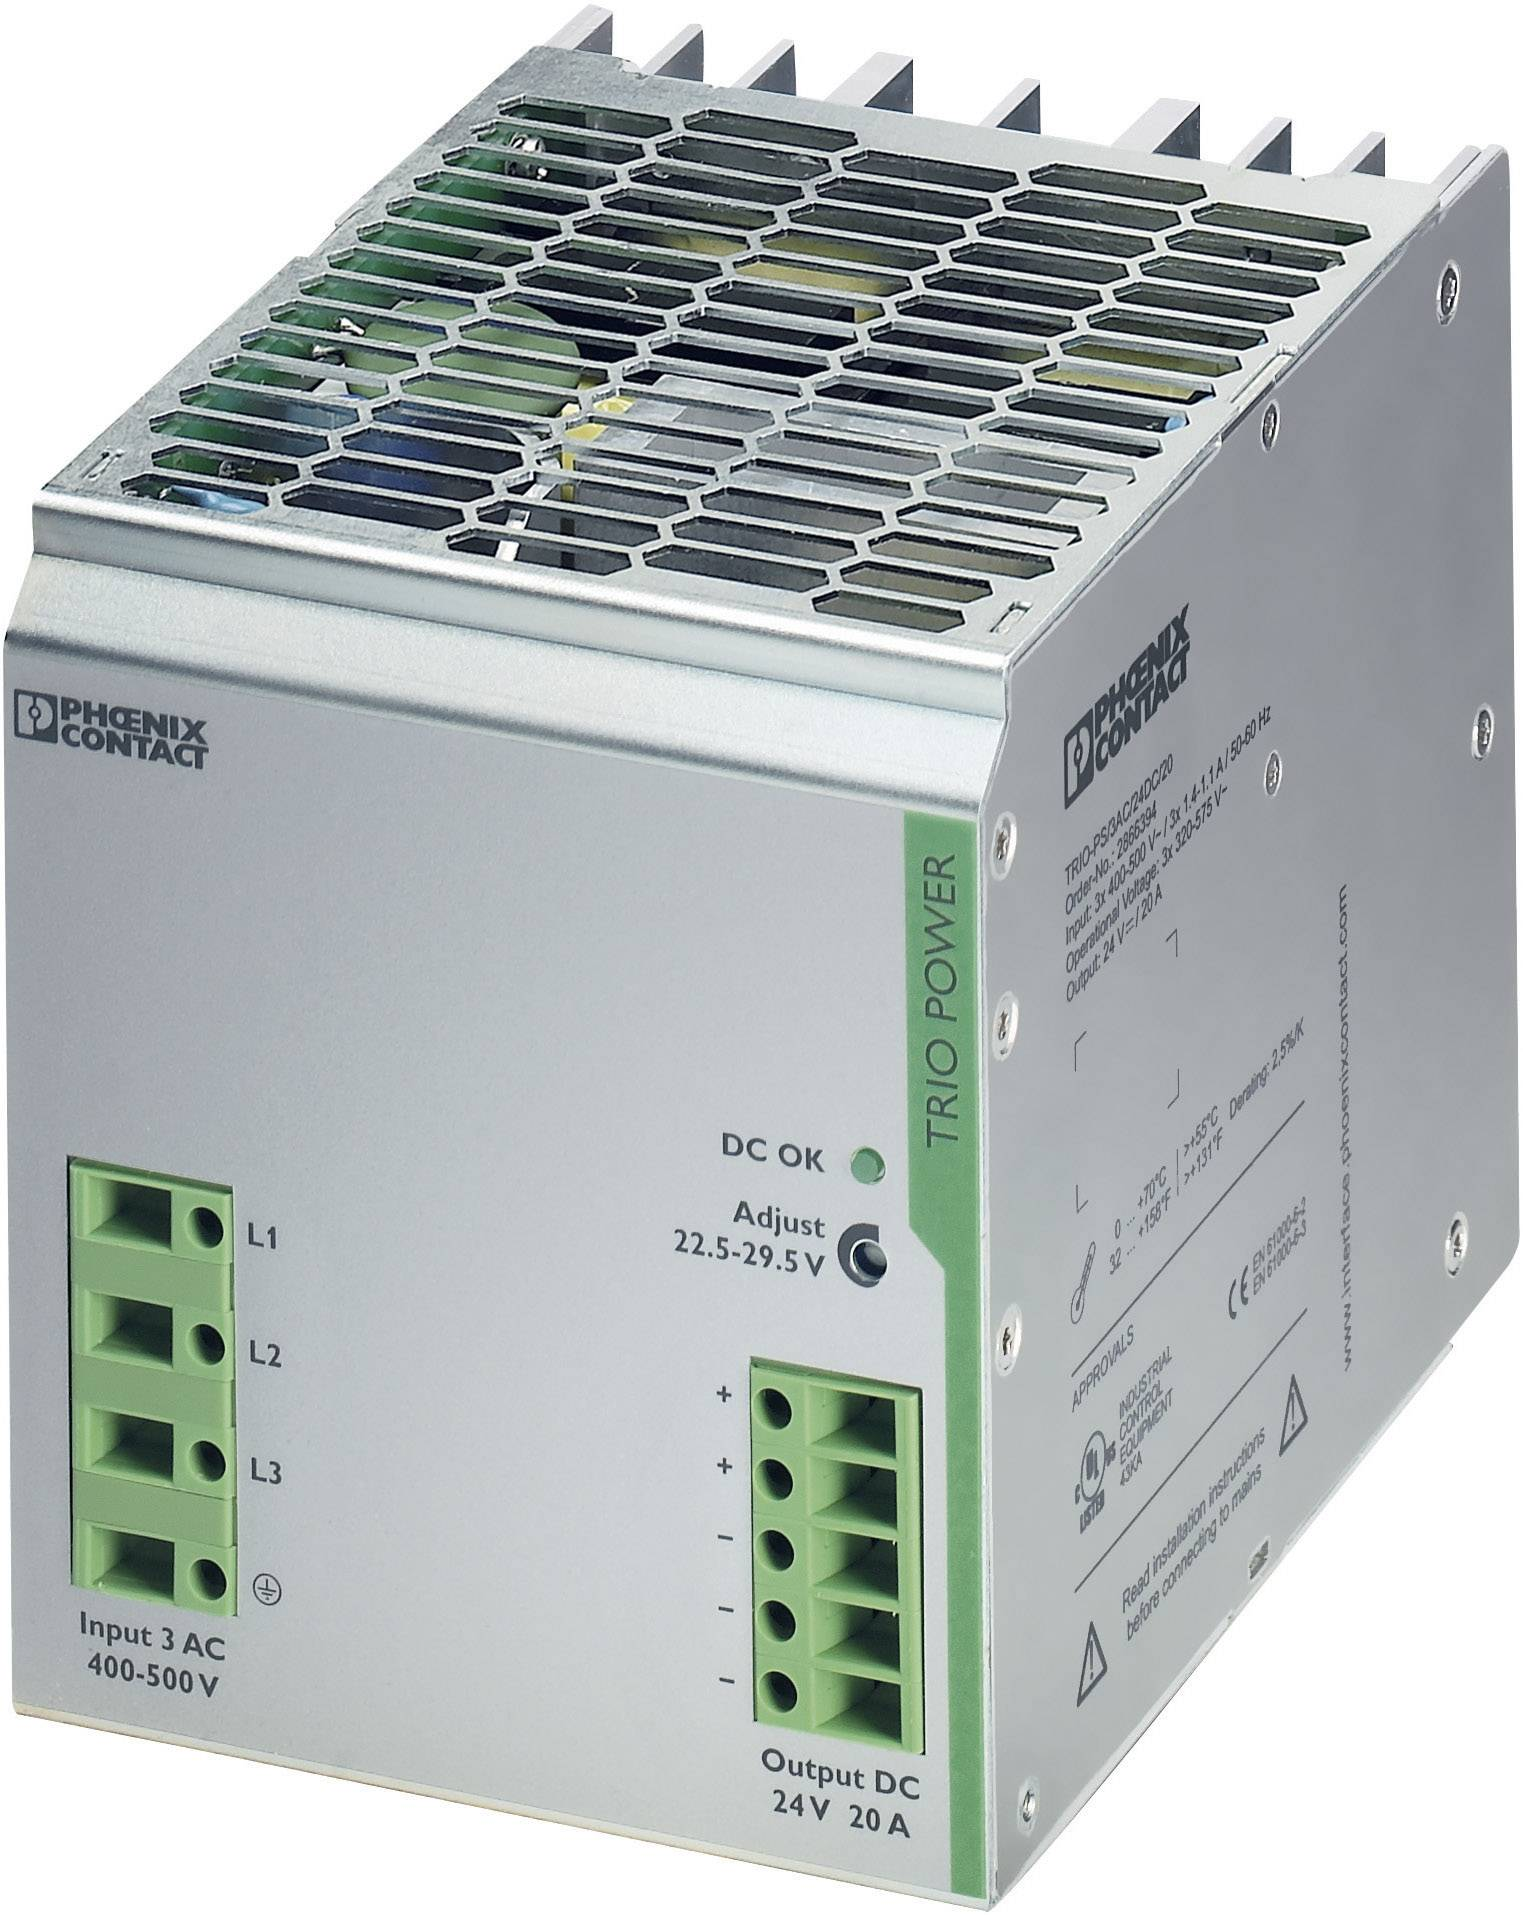 Sieťový zdroj na montážnu lištu (DIN lištu) Phoenix Contact TRIO-PS/3AC/24DC/20, 1 x, 24 V/DC, 20 A, 480 W